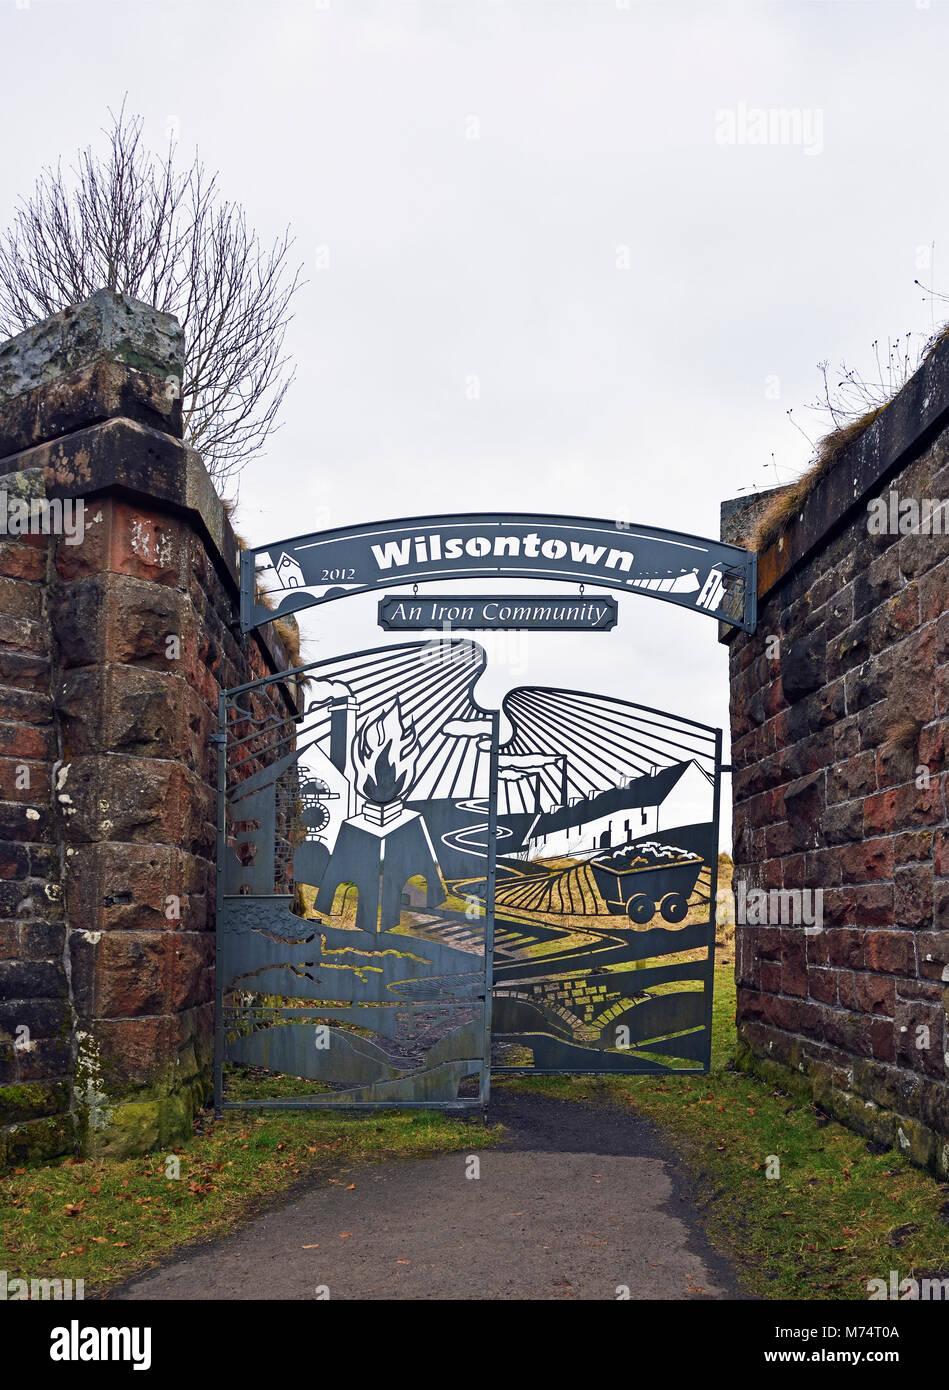 Ornamental metal entrance gates. Wilsontown, Forth, Lanarkshire, Scotland, United Kingdom, Europe. - Stock Image